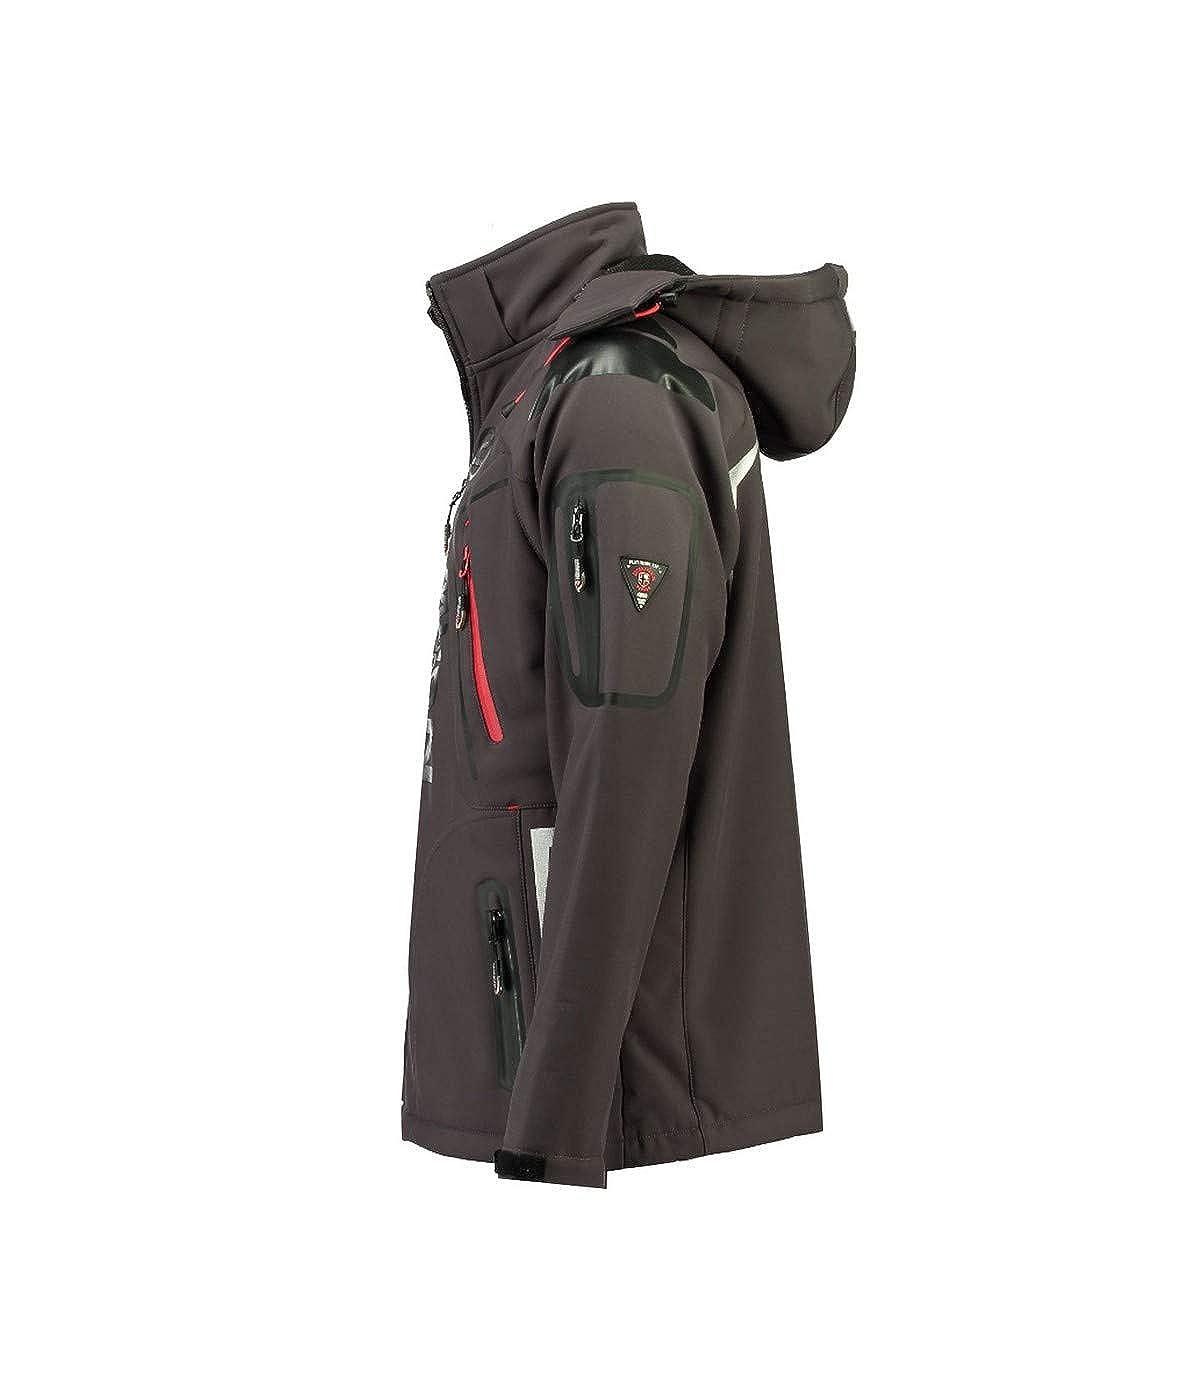 Giacca Giubbotto Uomo Geographical Norway Tangata Men Jacket Men